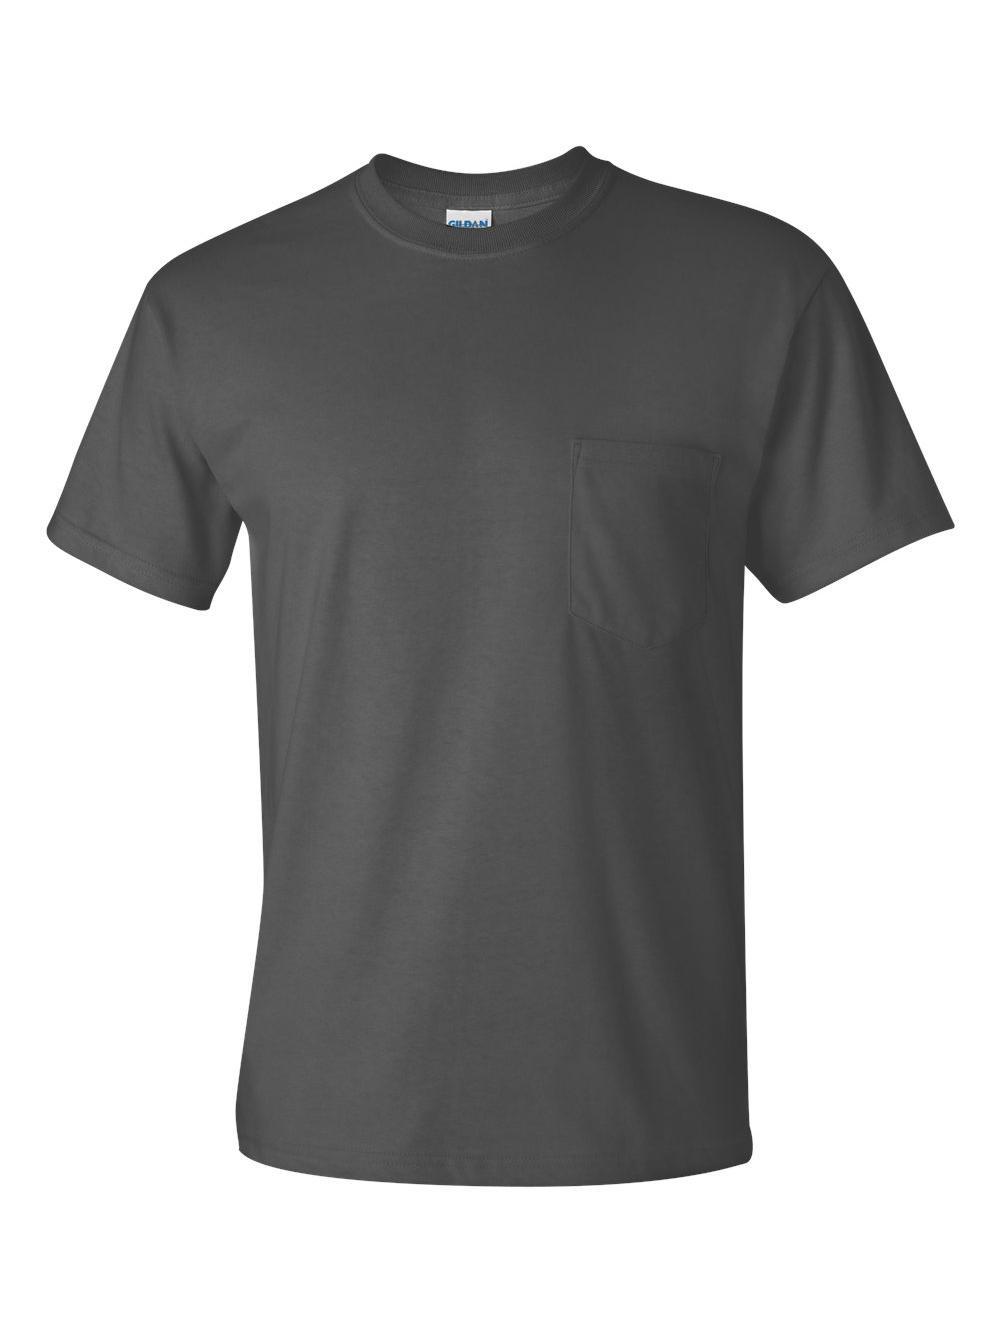 Gildan-Ultra-Cotton-T-Shirt-with-a-Pocket-2300 thumbnail 9